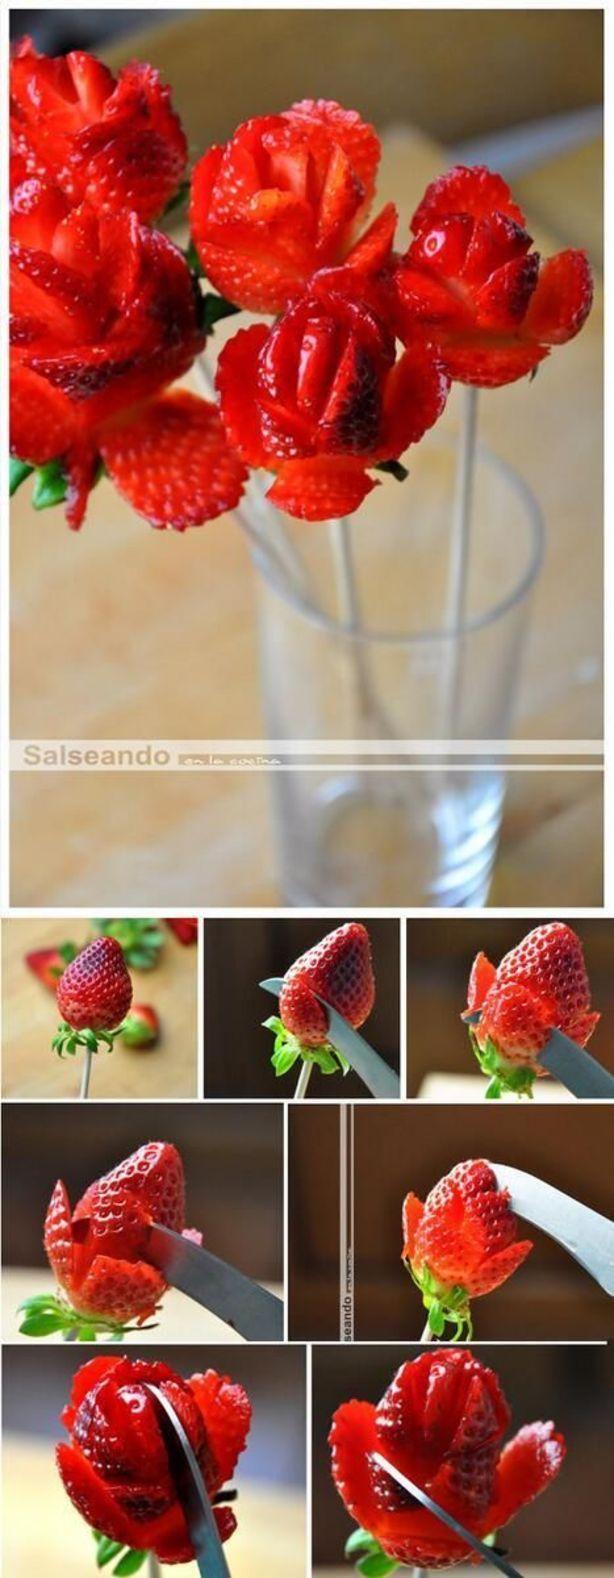 erg leuk! roosjes van aardbeien.